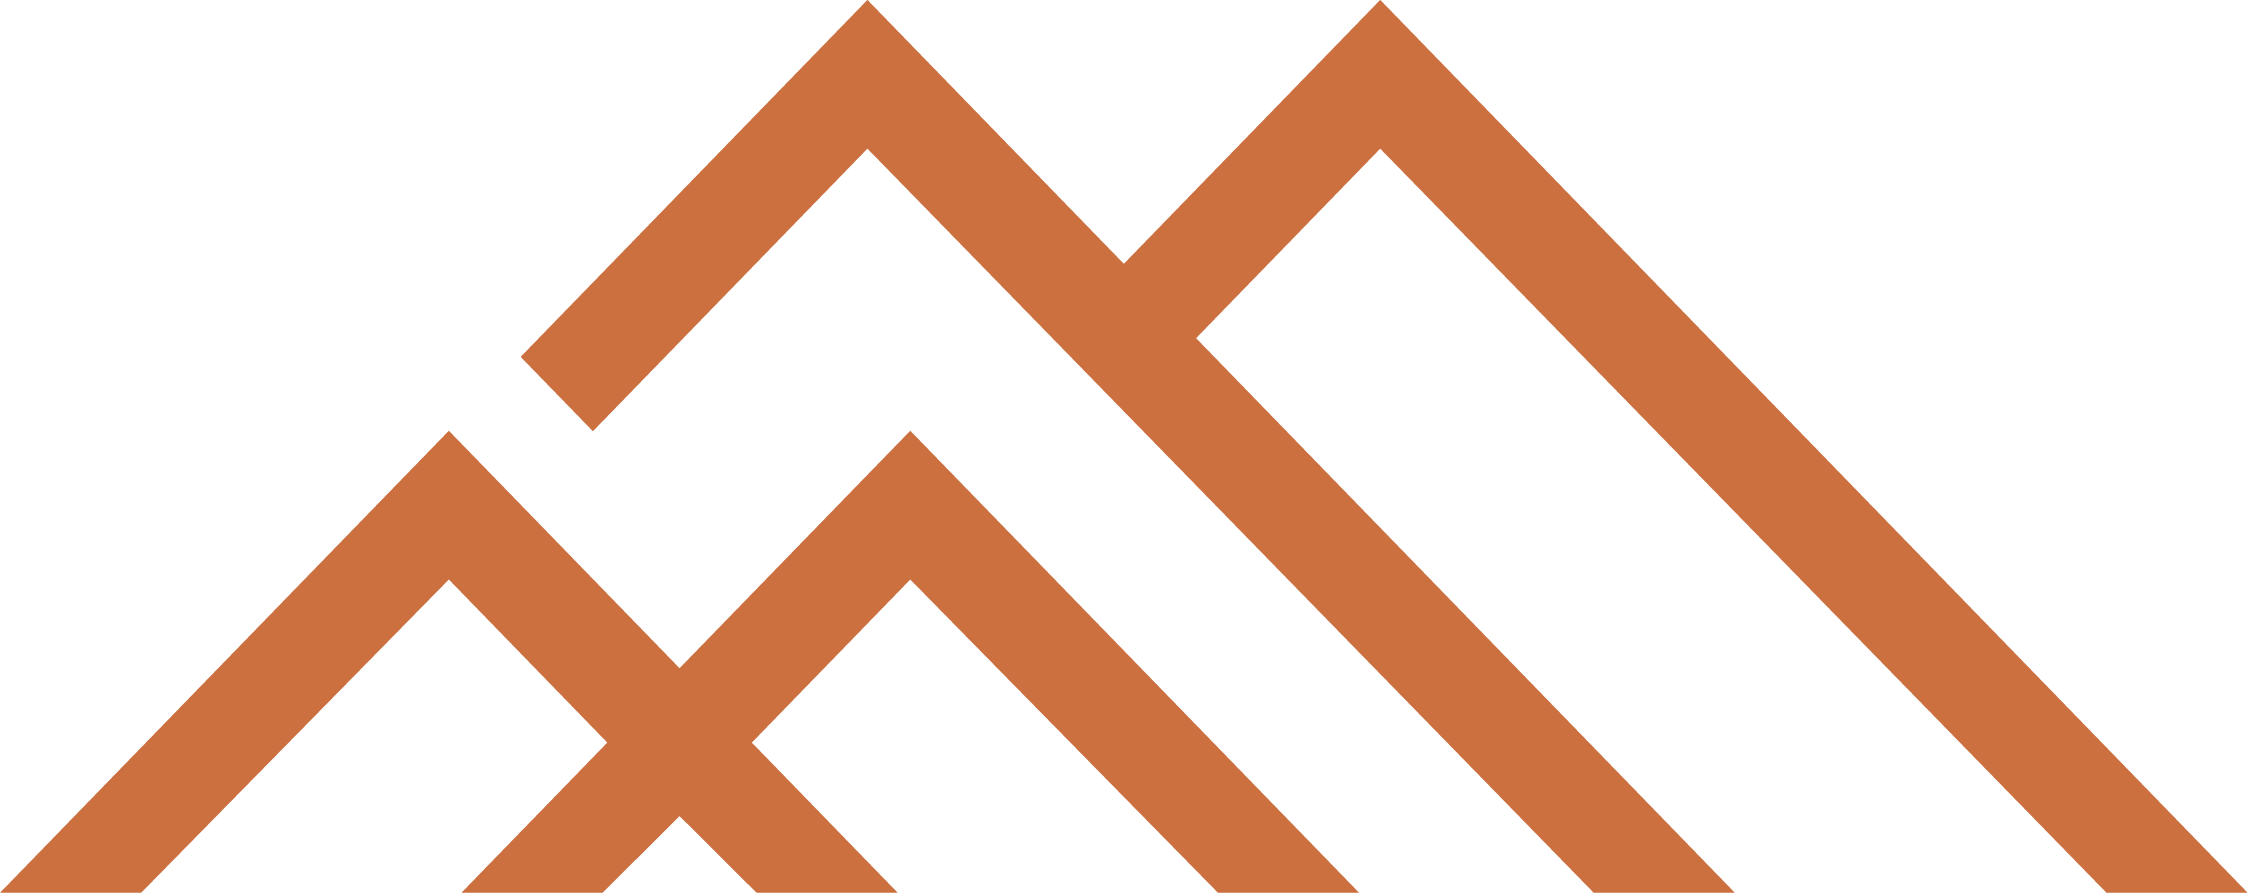 Momenta Recovery Orange Image Logo.png